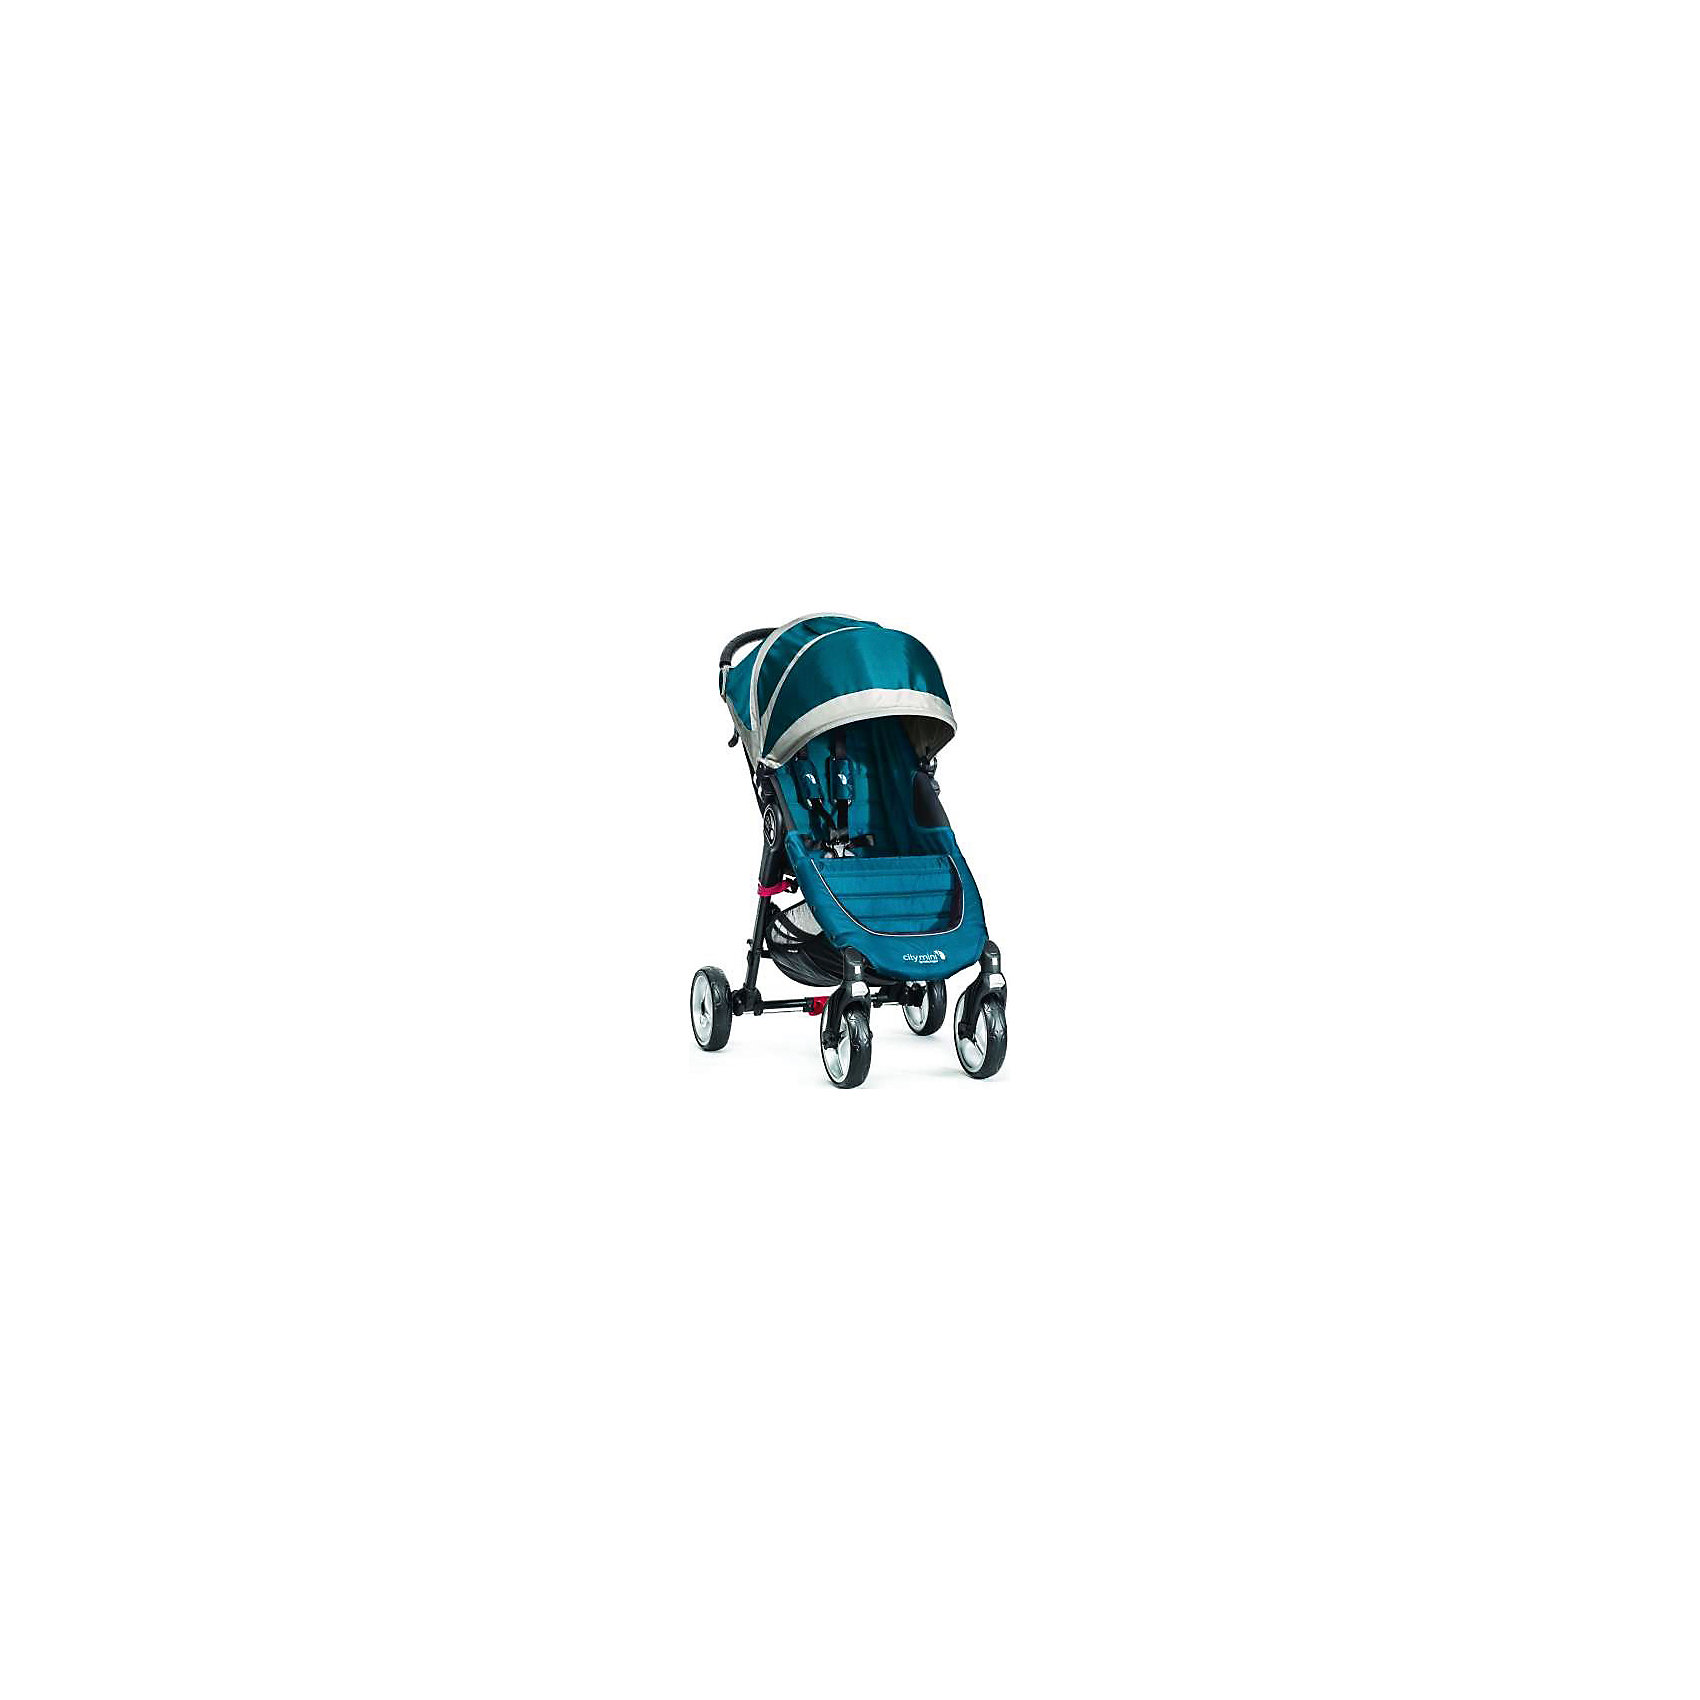 Прогулочная коляска City Mini Single 4Wheel, Baby Jogger, бирюзовый-серый